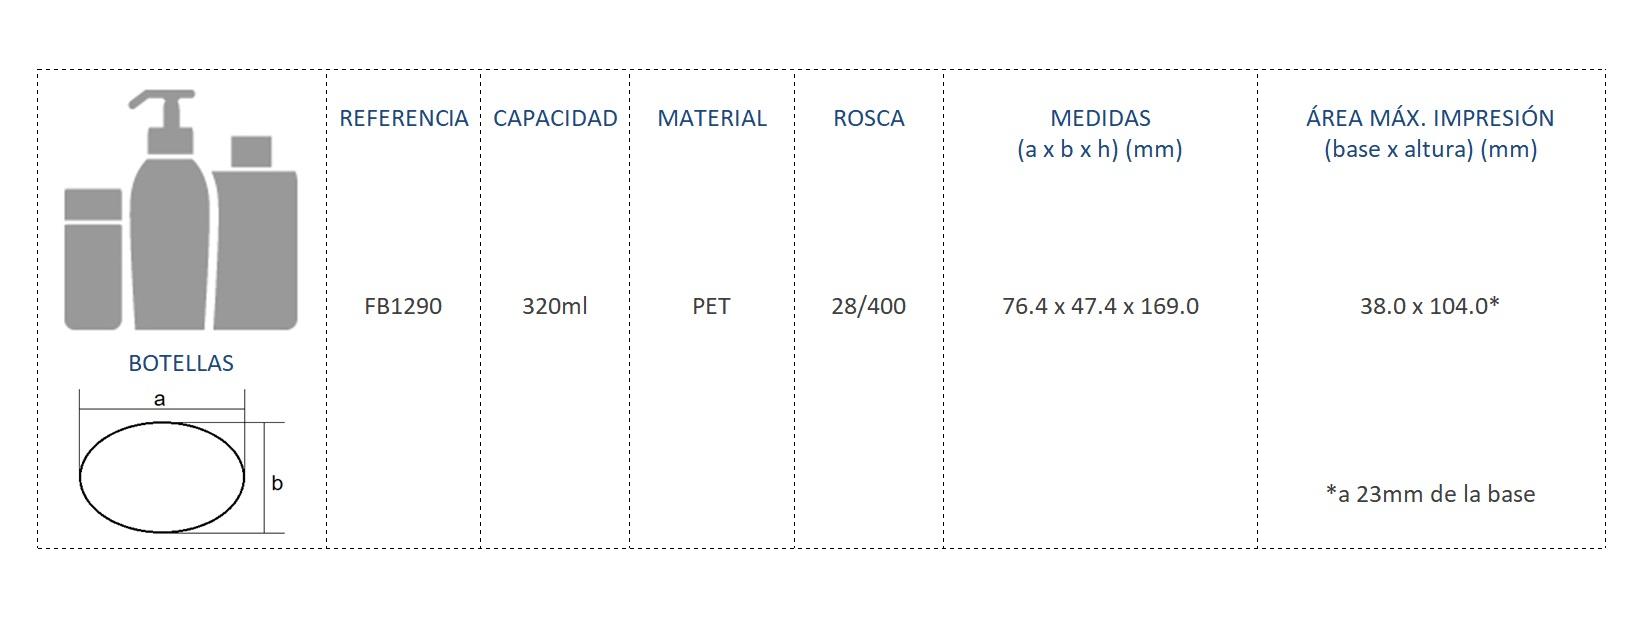 Cuadro de materiales botella FB1290